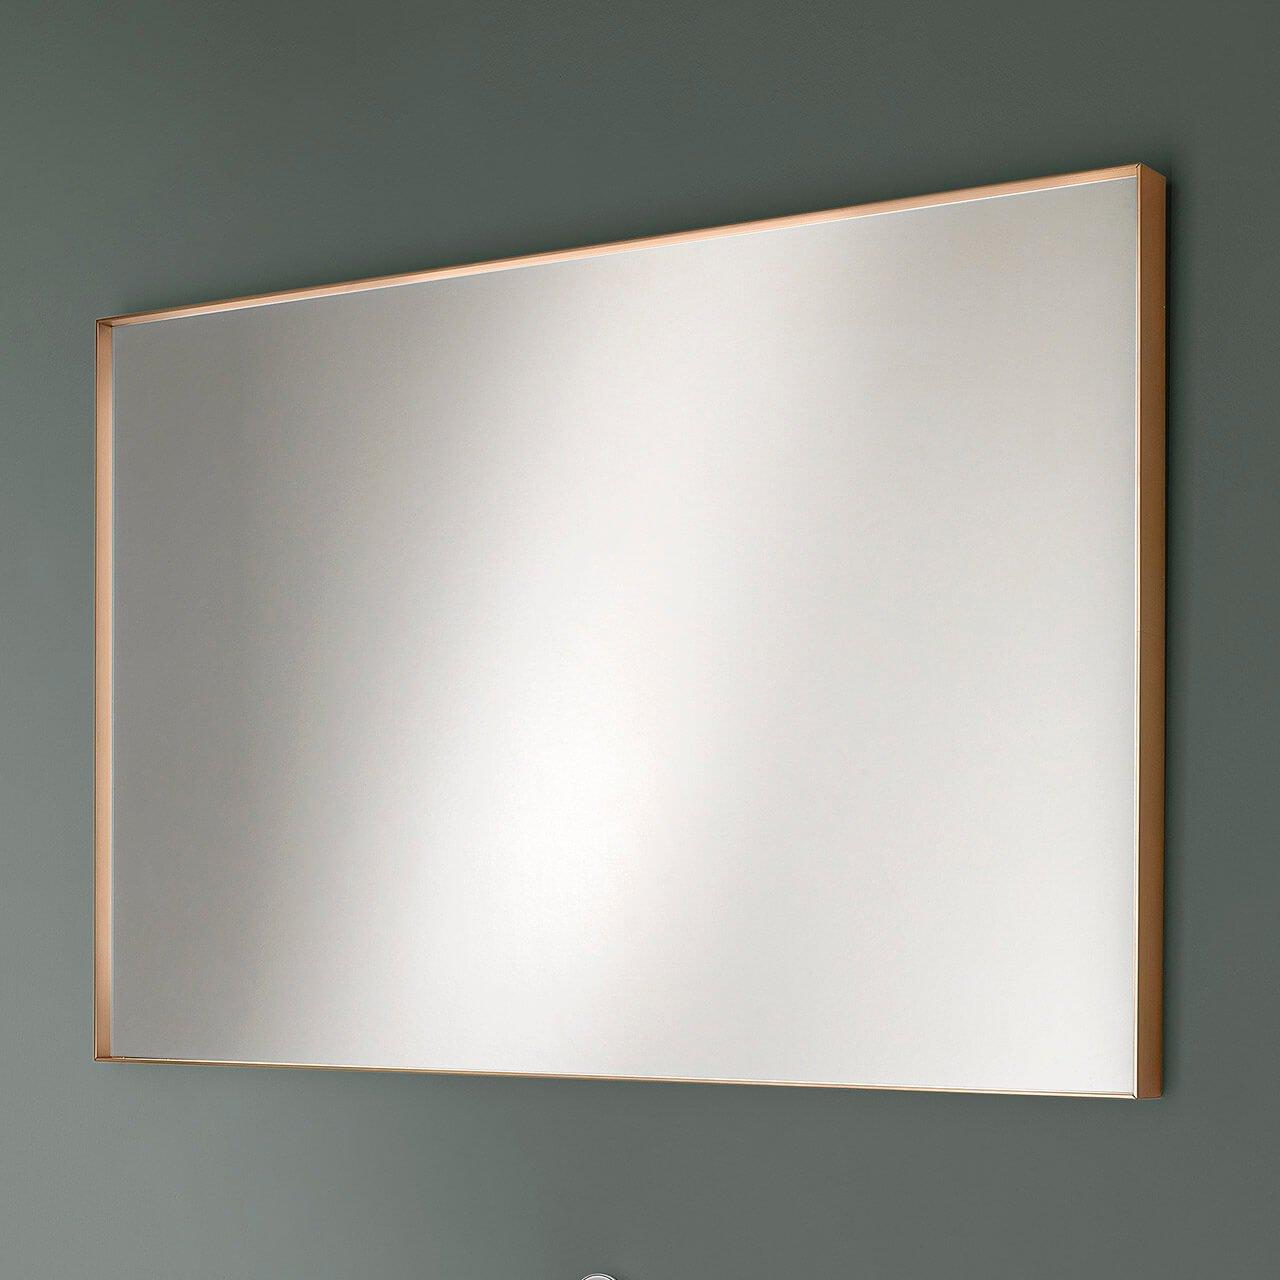 specchio CharmeS rame